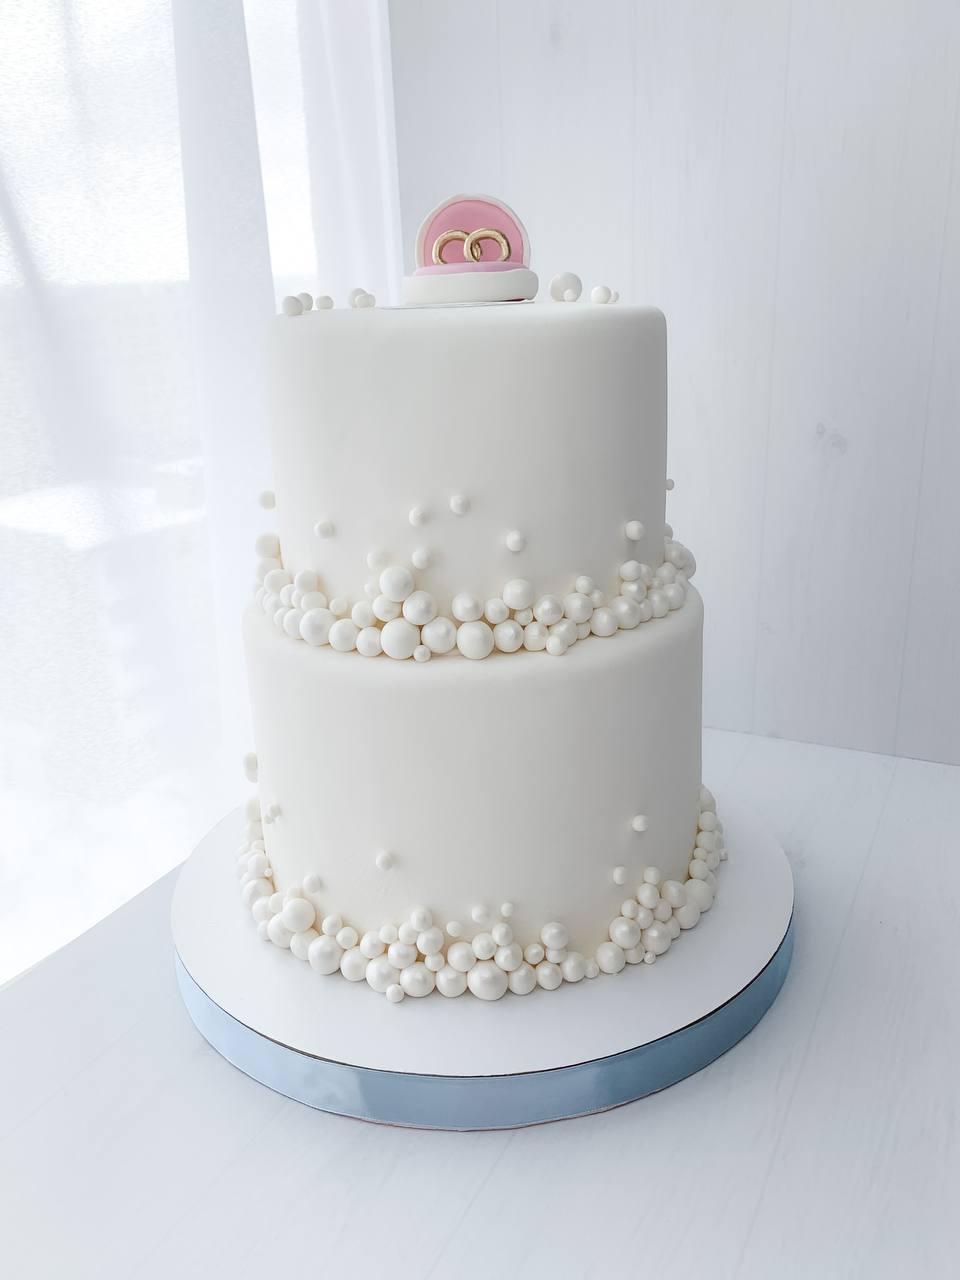 cupcake-gueen-12